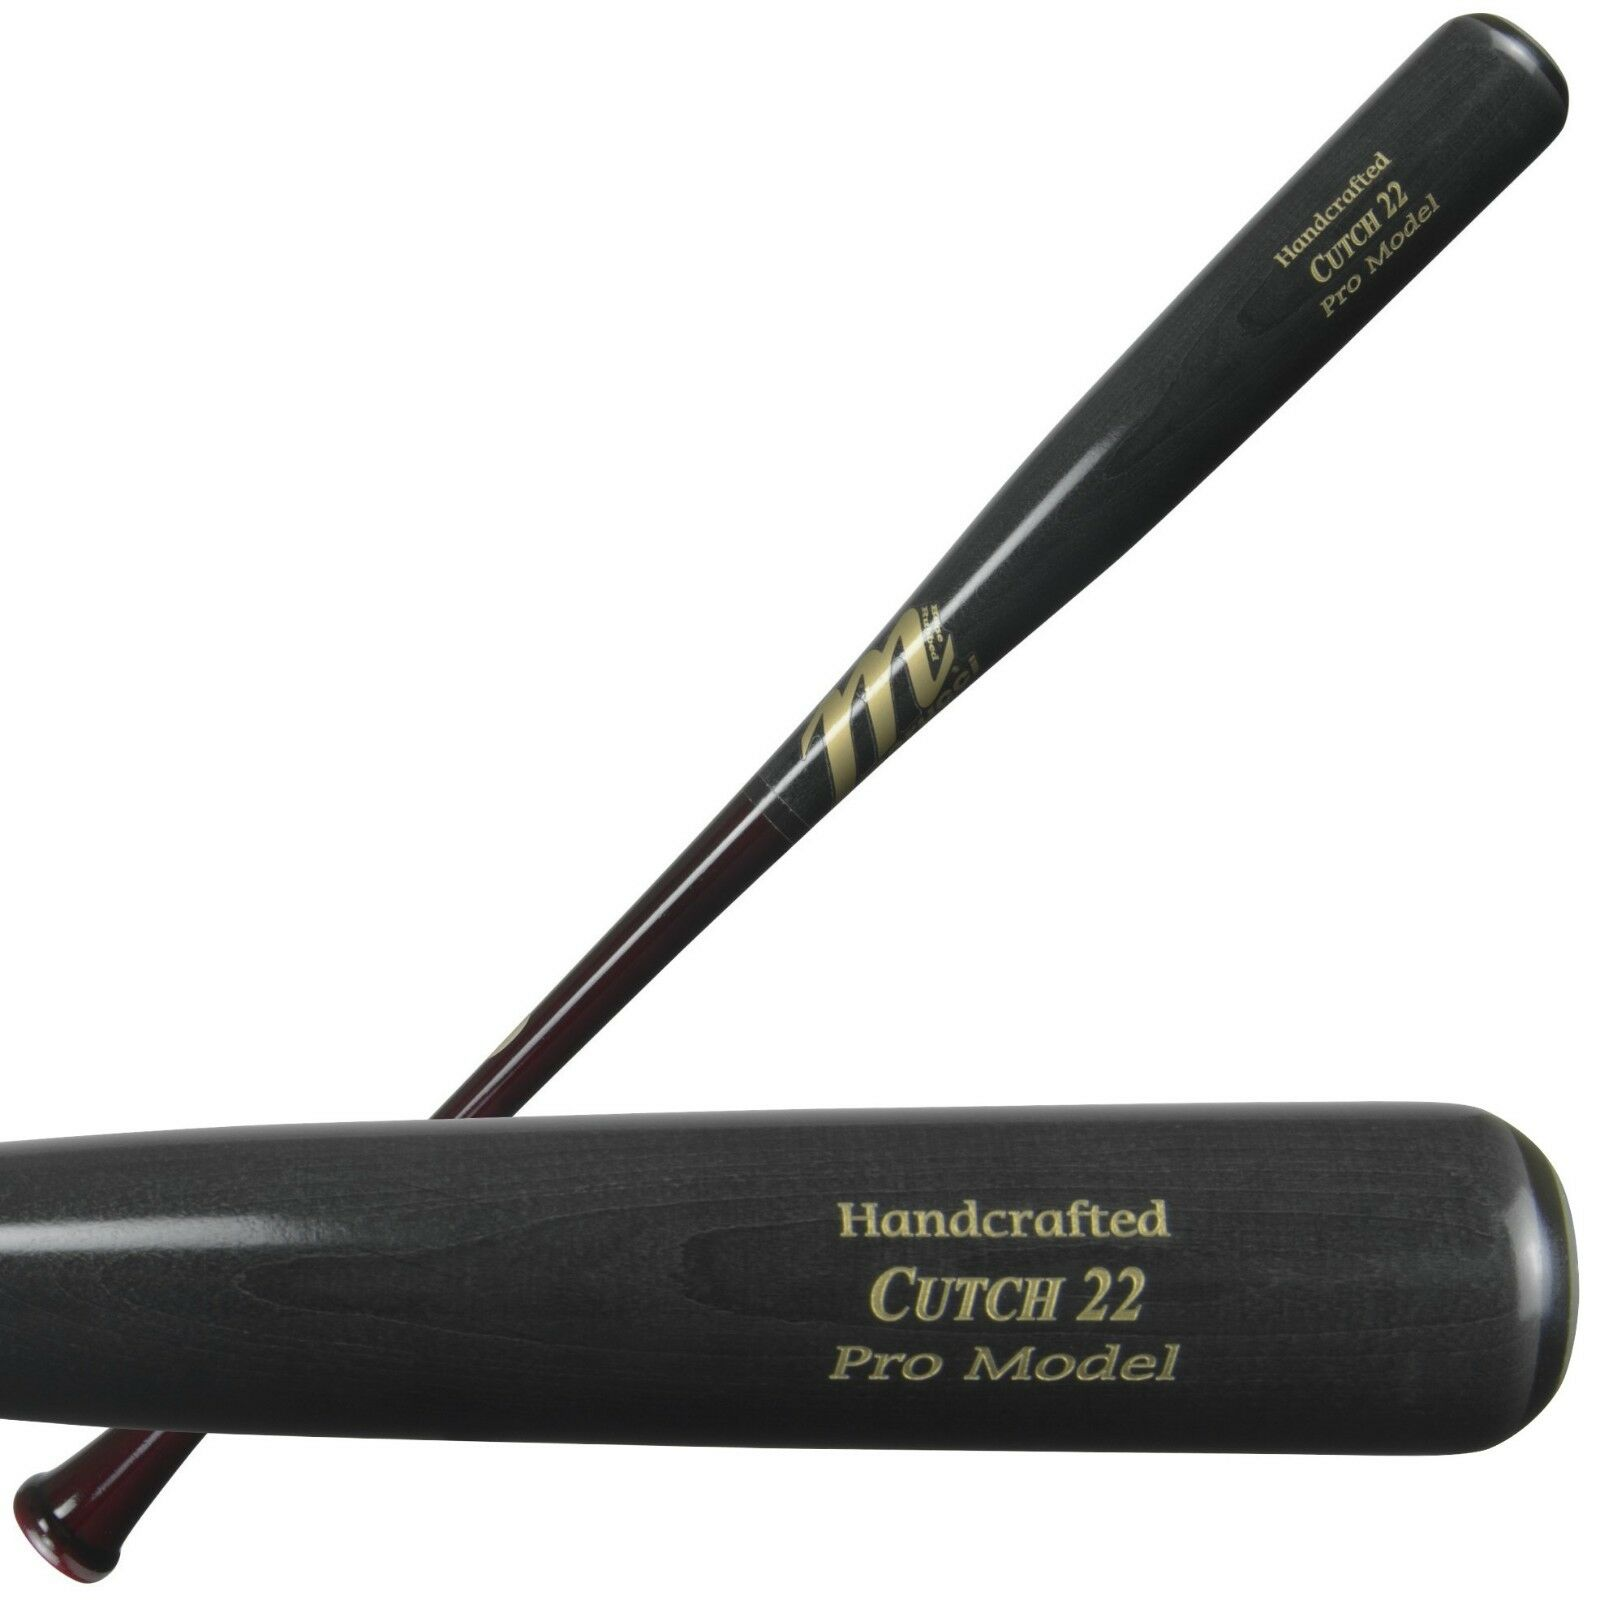 Marucci cachú 22 Pro Modelo 34  madera bate de béisbol Cereza niebla mveicutch 22-CH FG